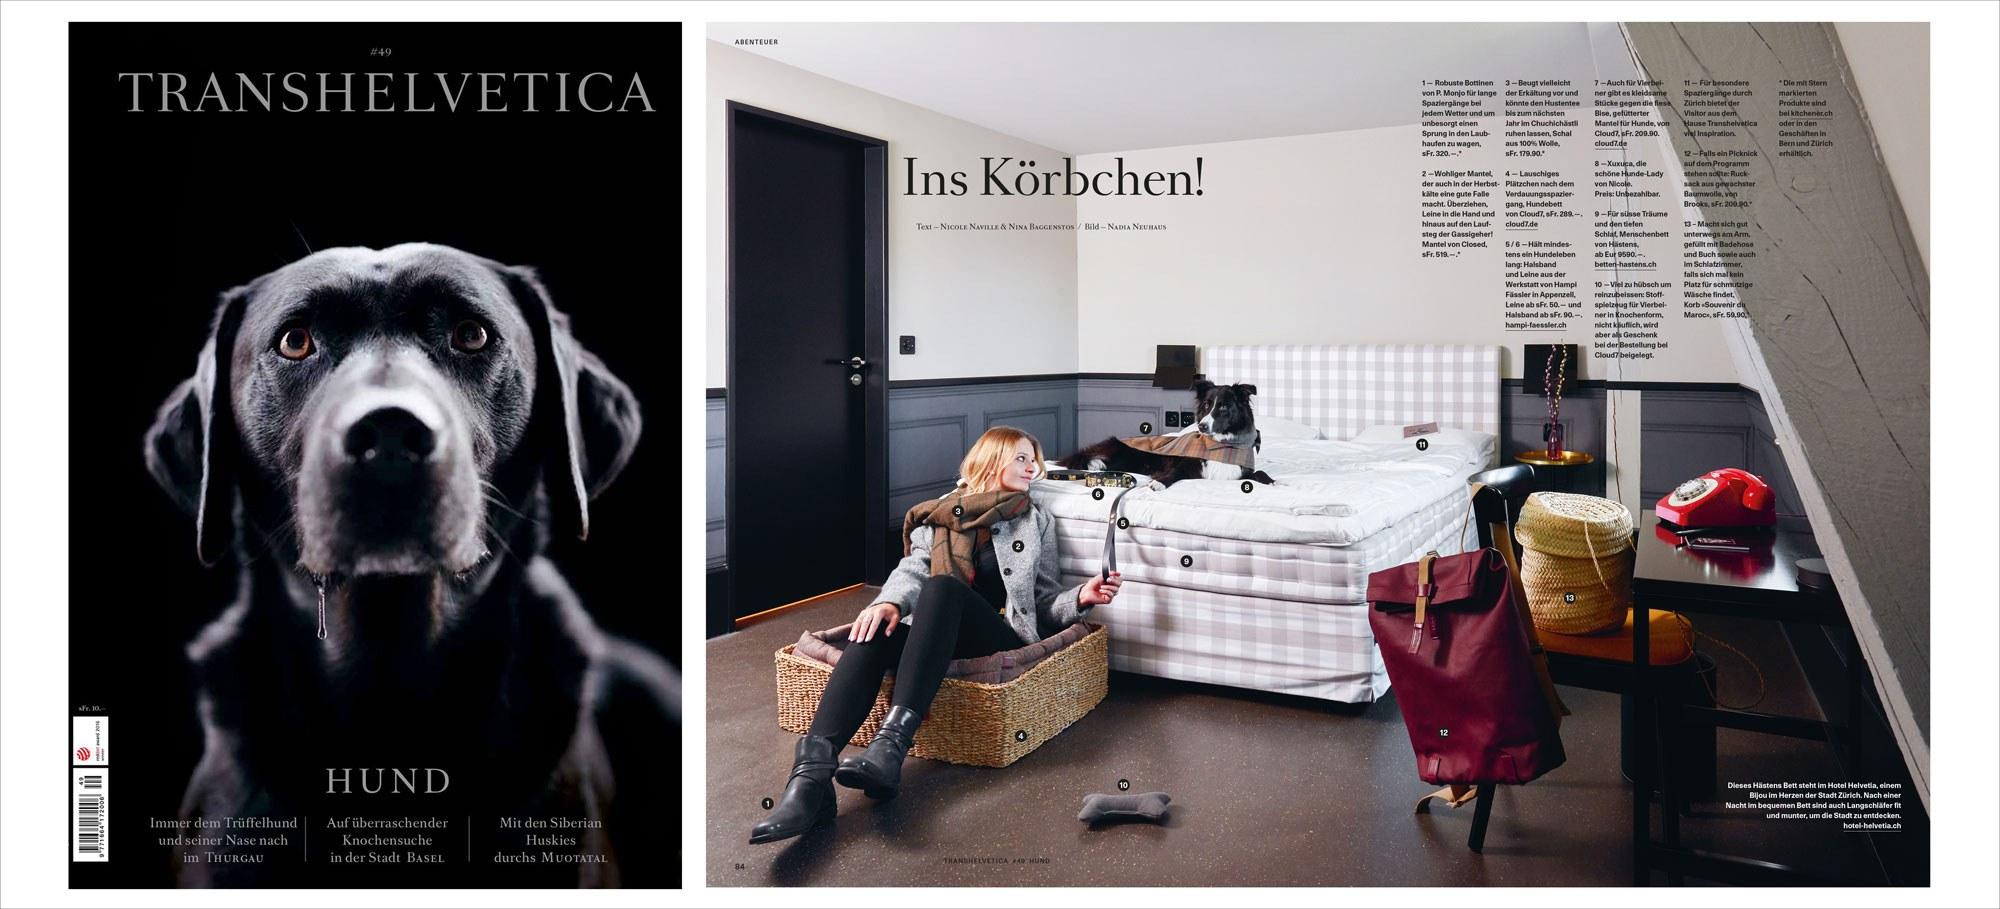 Swiss Travel Magazine Transhelvetica